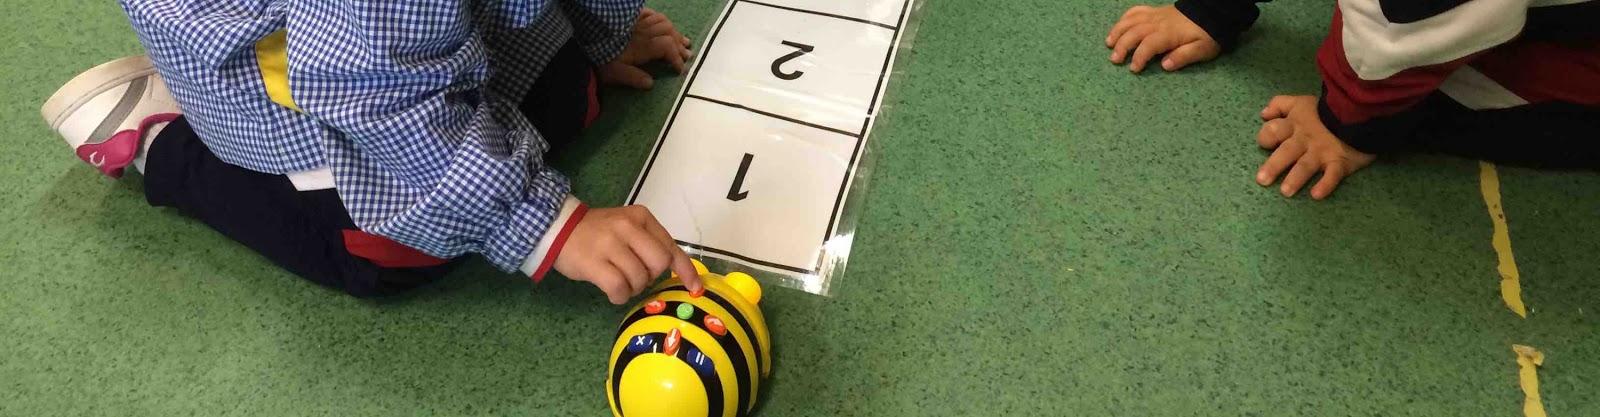 Robótica-Lego-aprendizaje